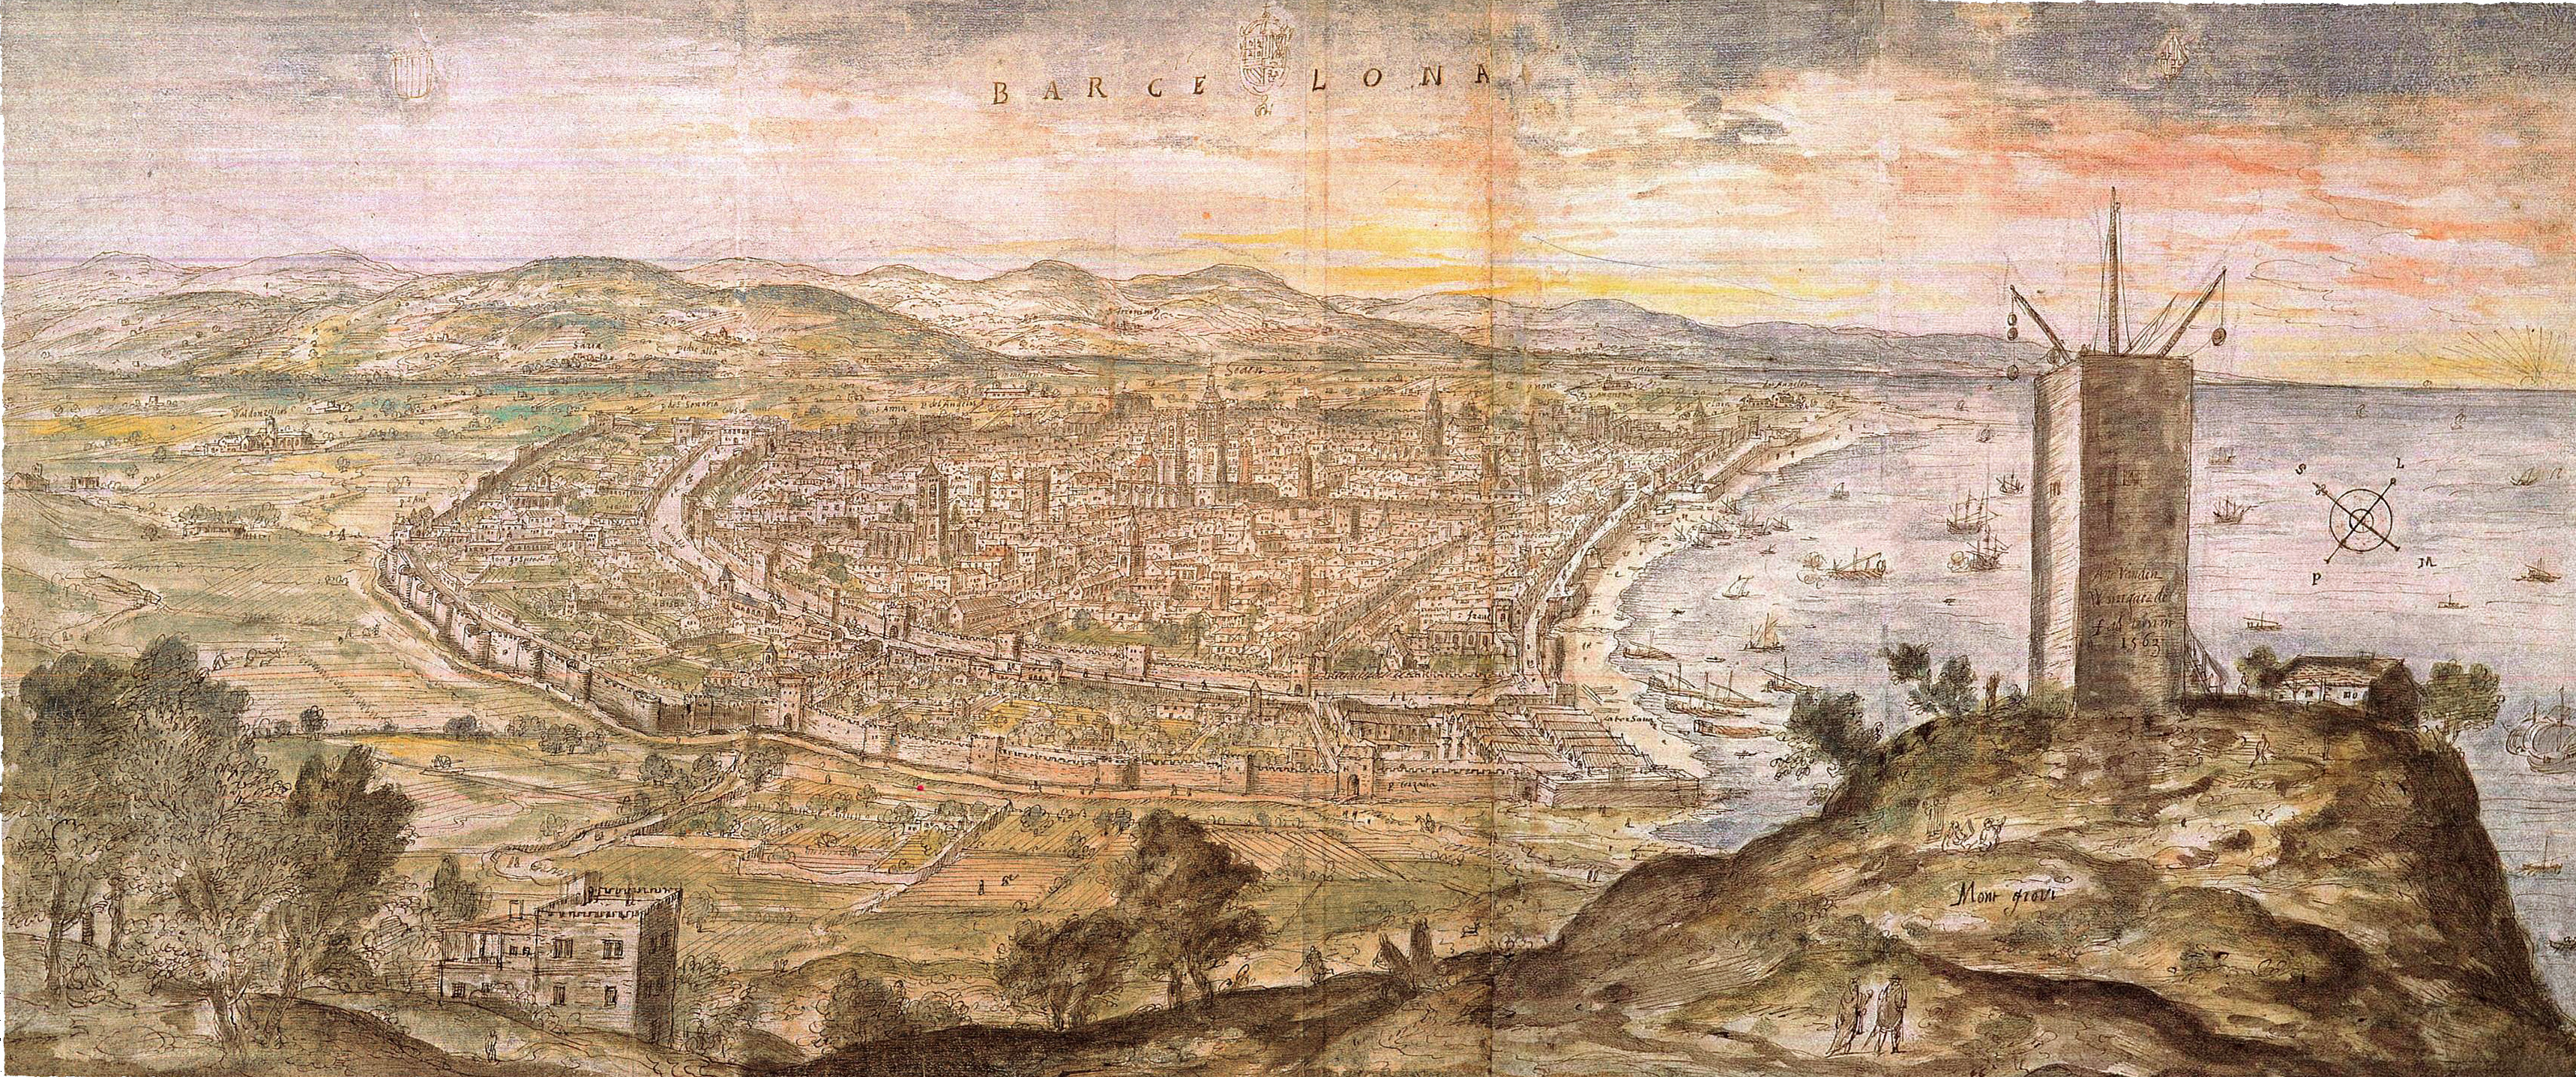 File:Wyngaerde Barcelona 1563.jpg